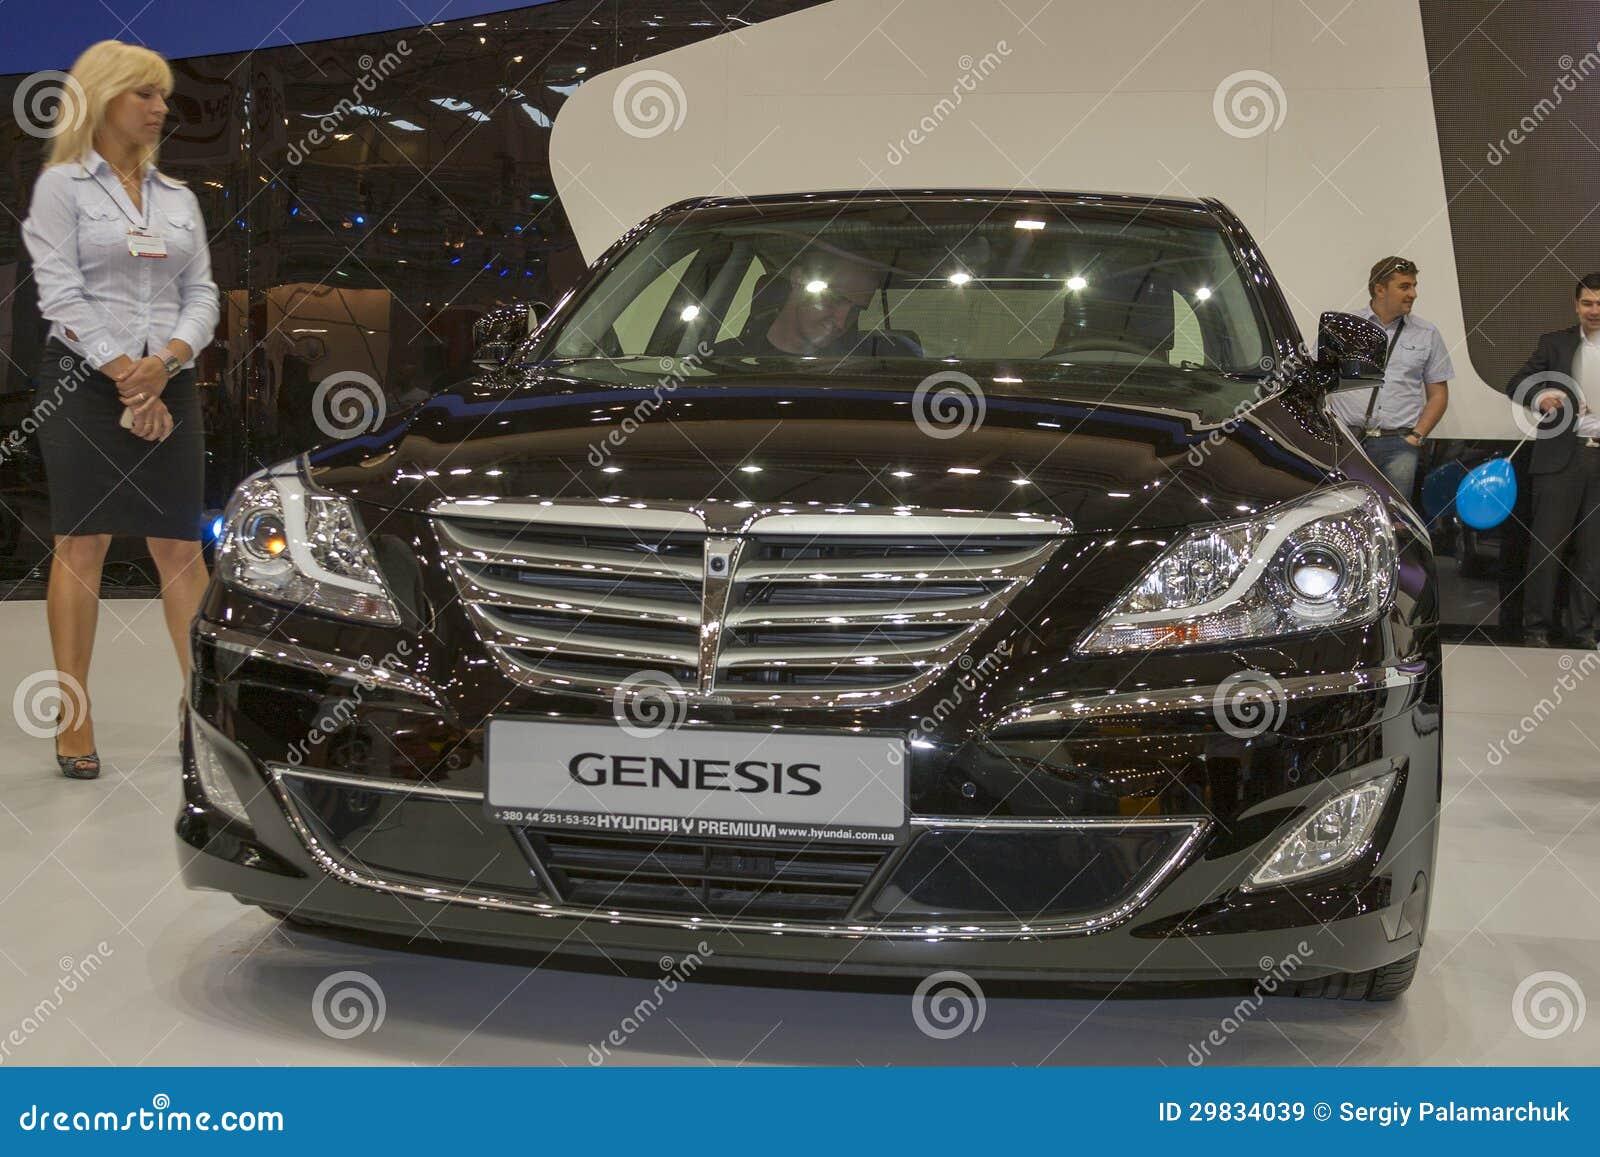 hyundai genesis car model on display editorial stock image image 29834039. Black Bedroom Furniture Sets. Home Design Ideas